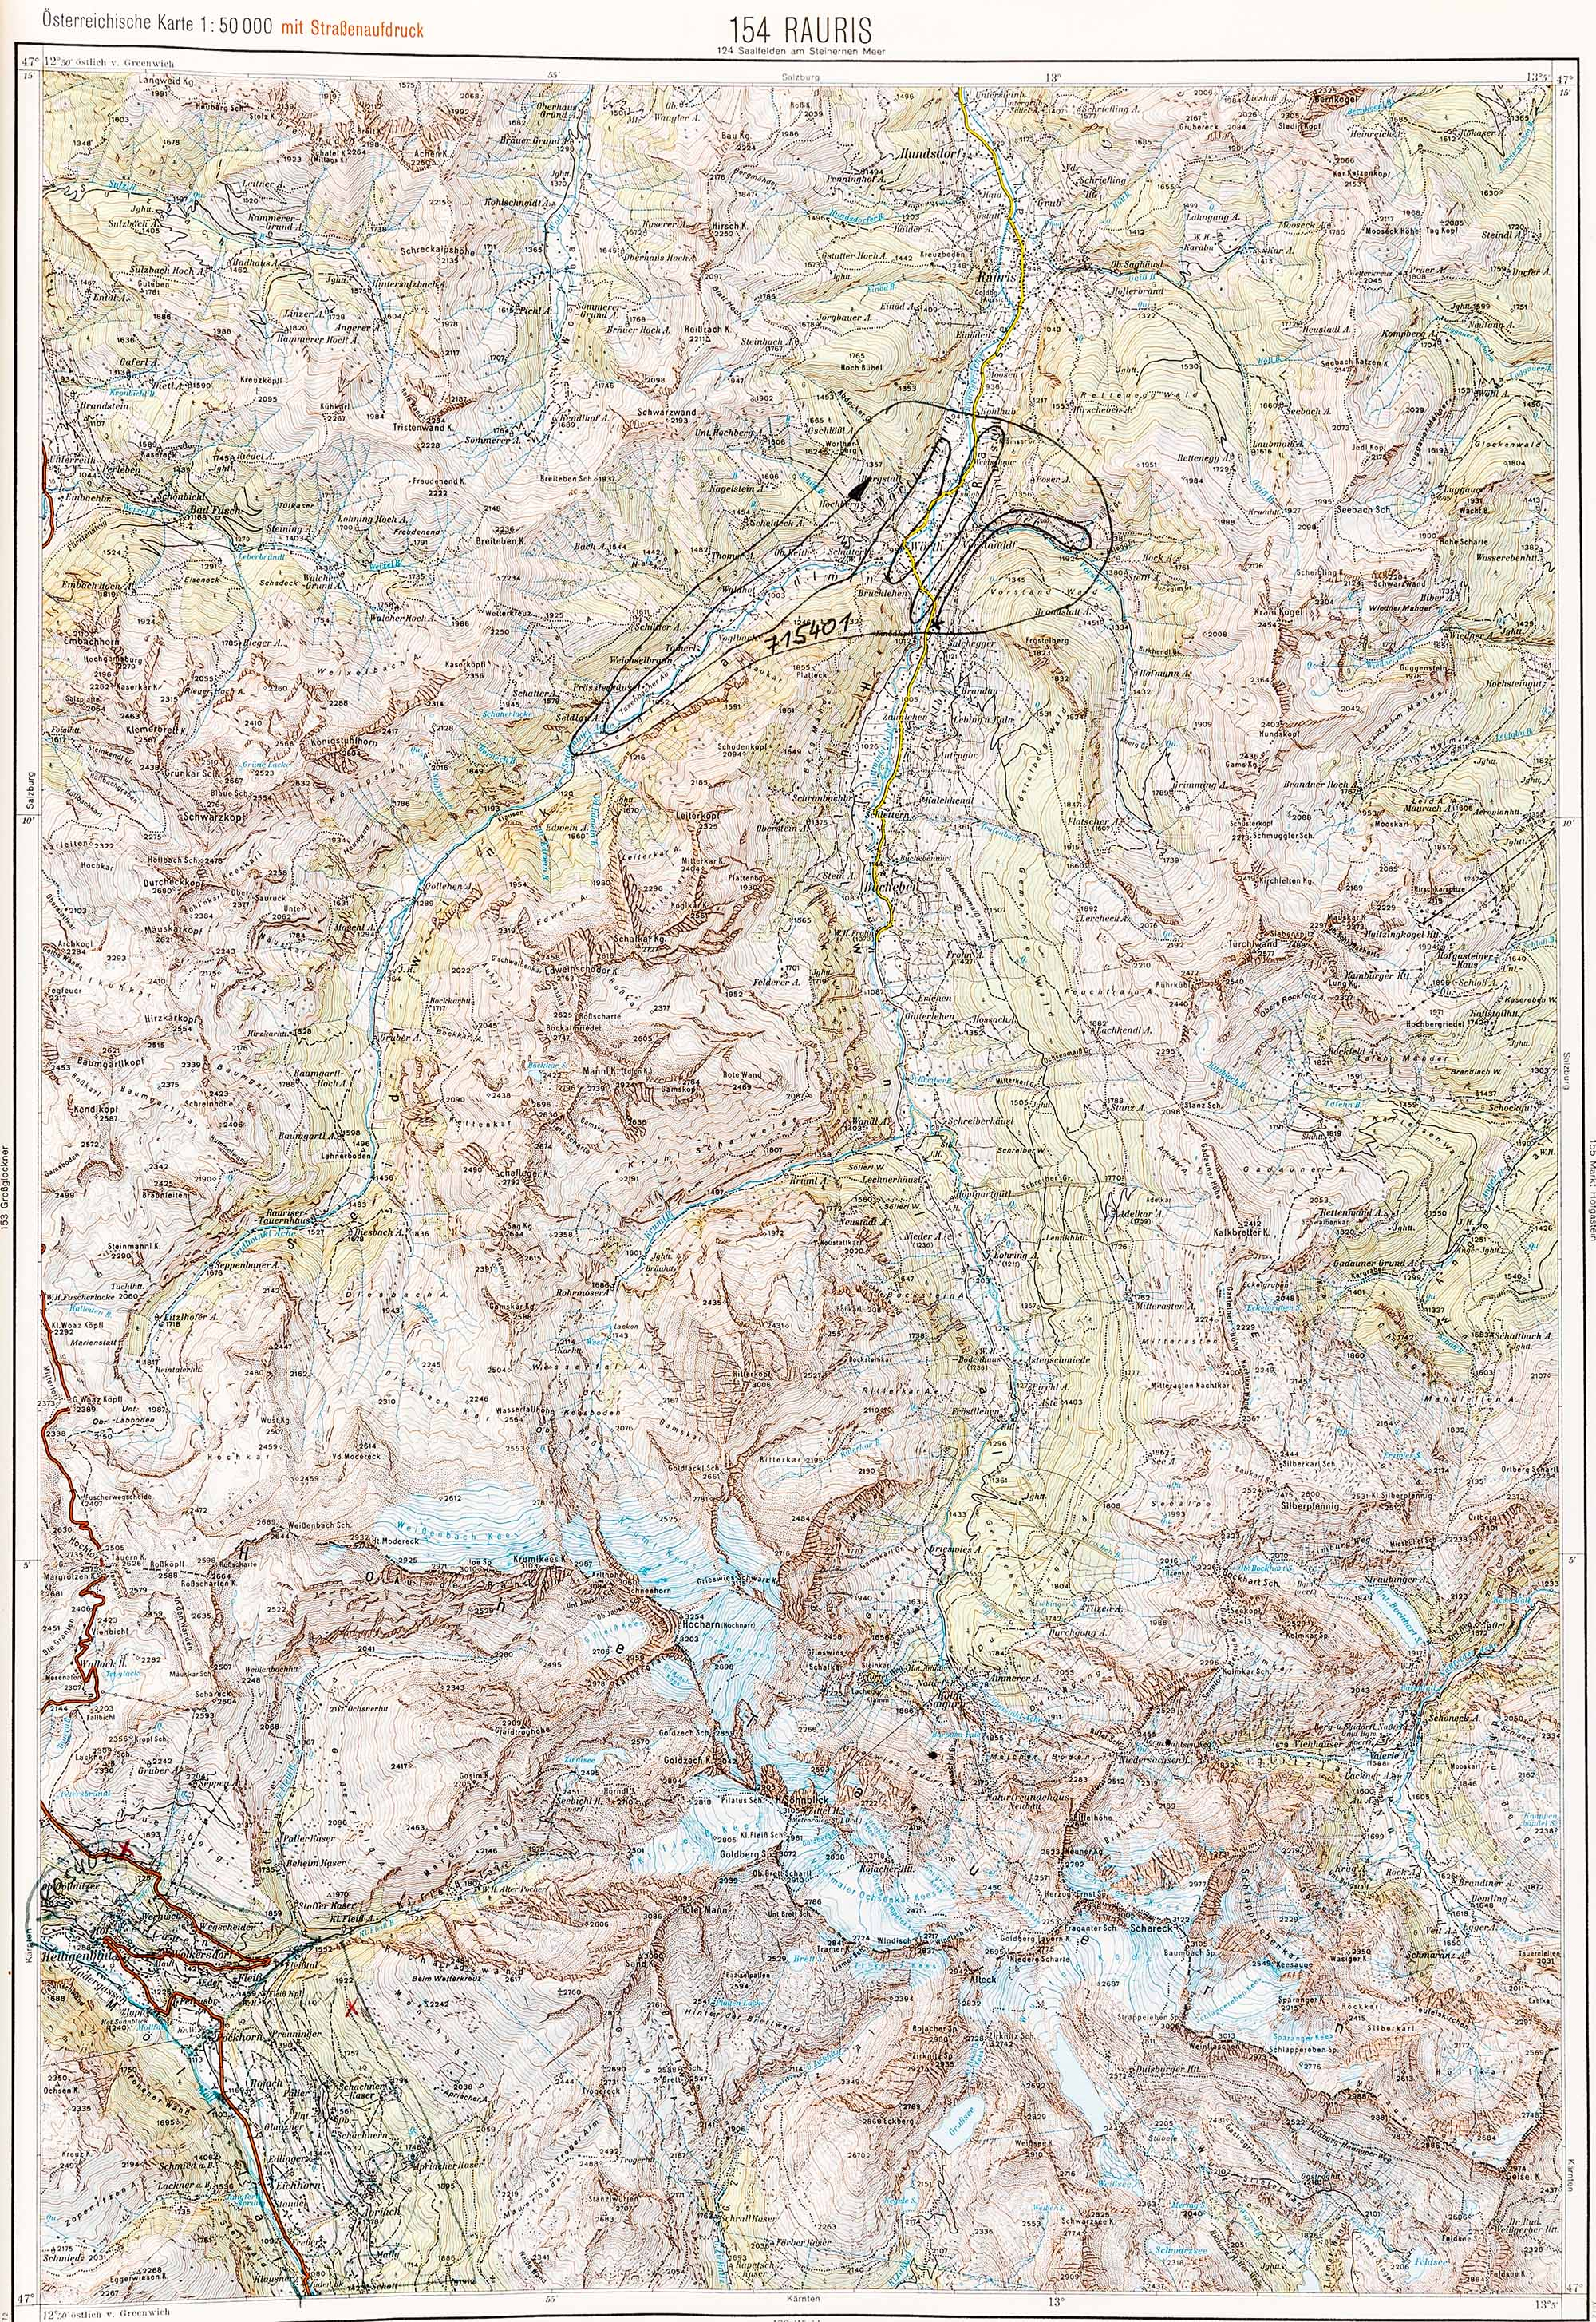 1975-1979 Karte 154